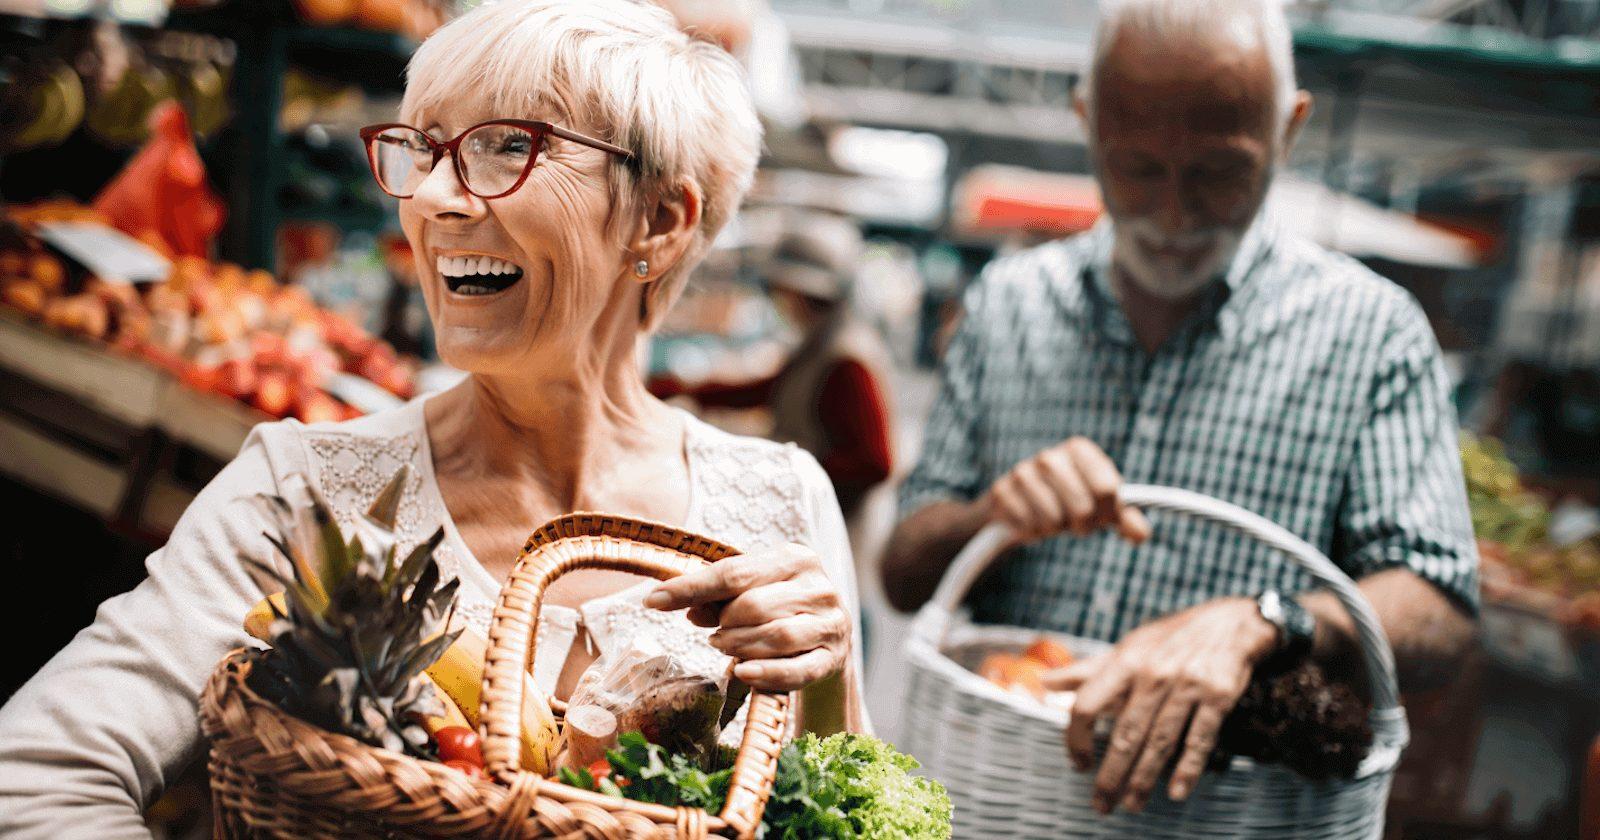 Colitis ulcerosa: Ernährung | Tipps & wichtige Nährstoffe ...